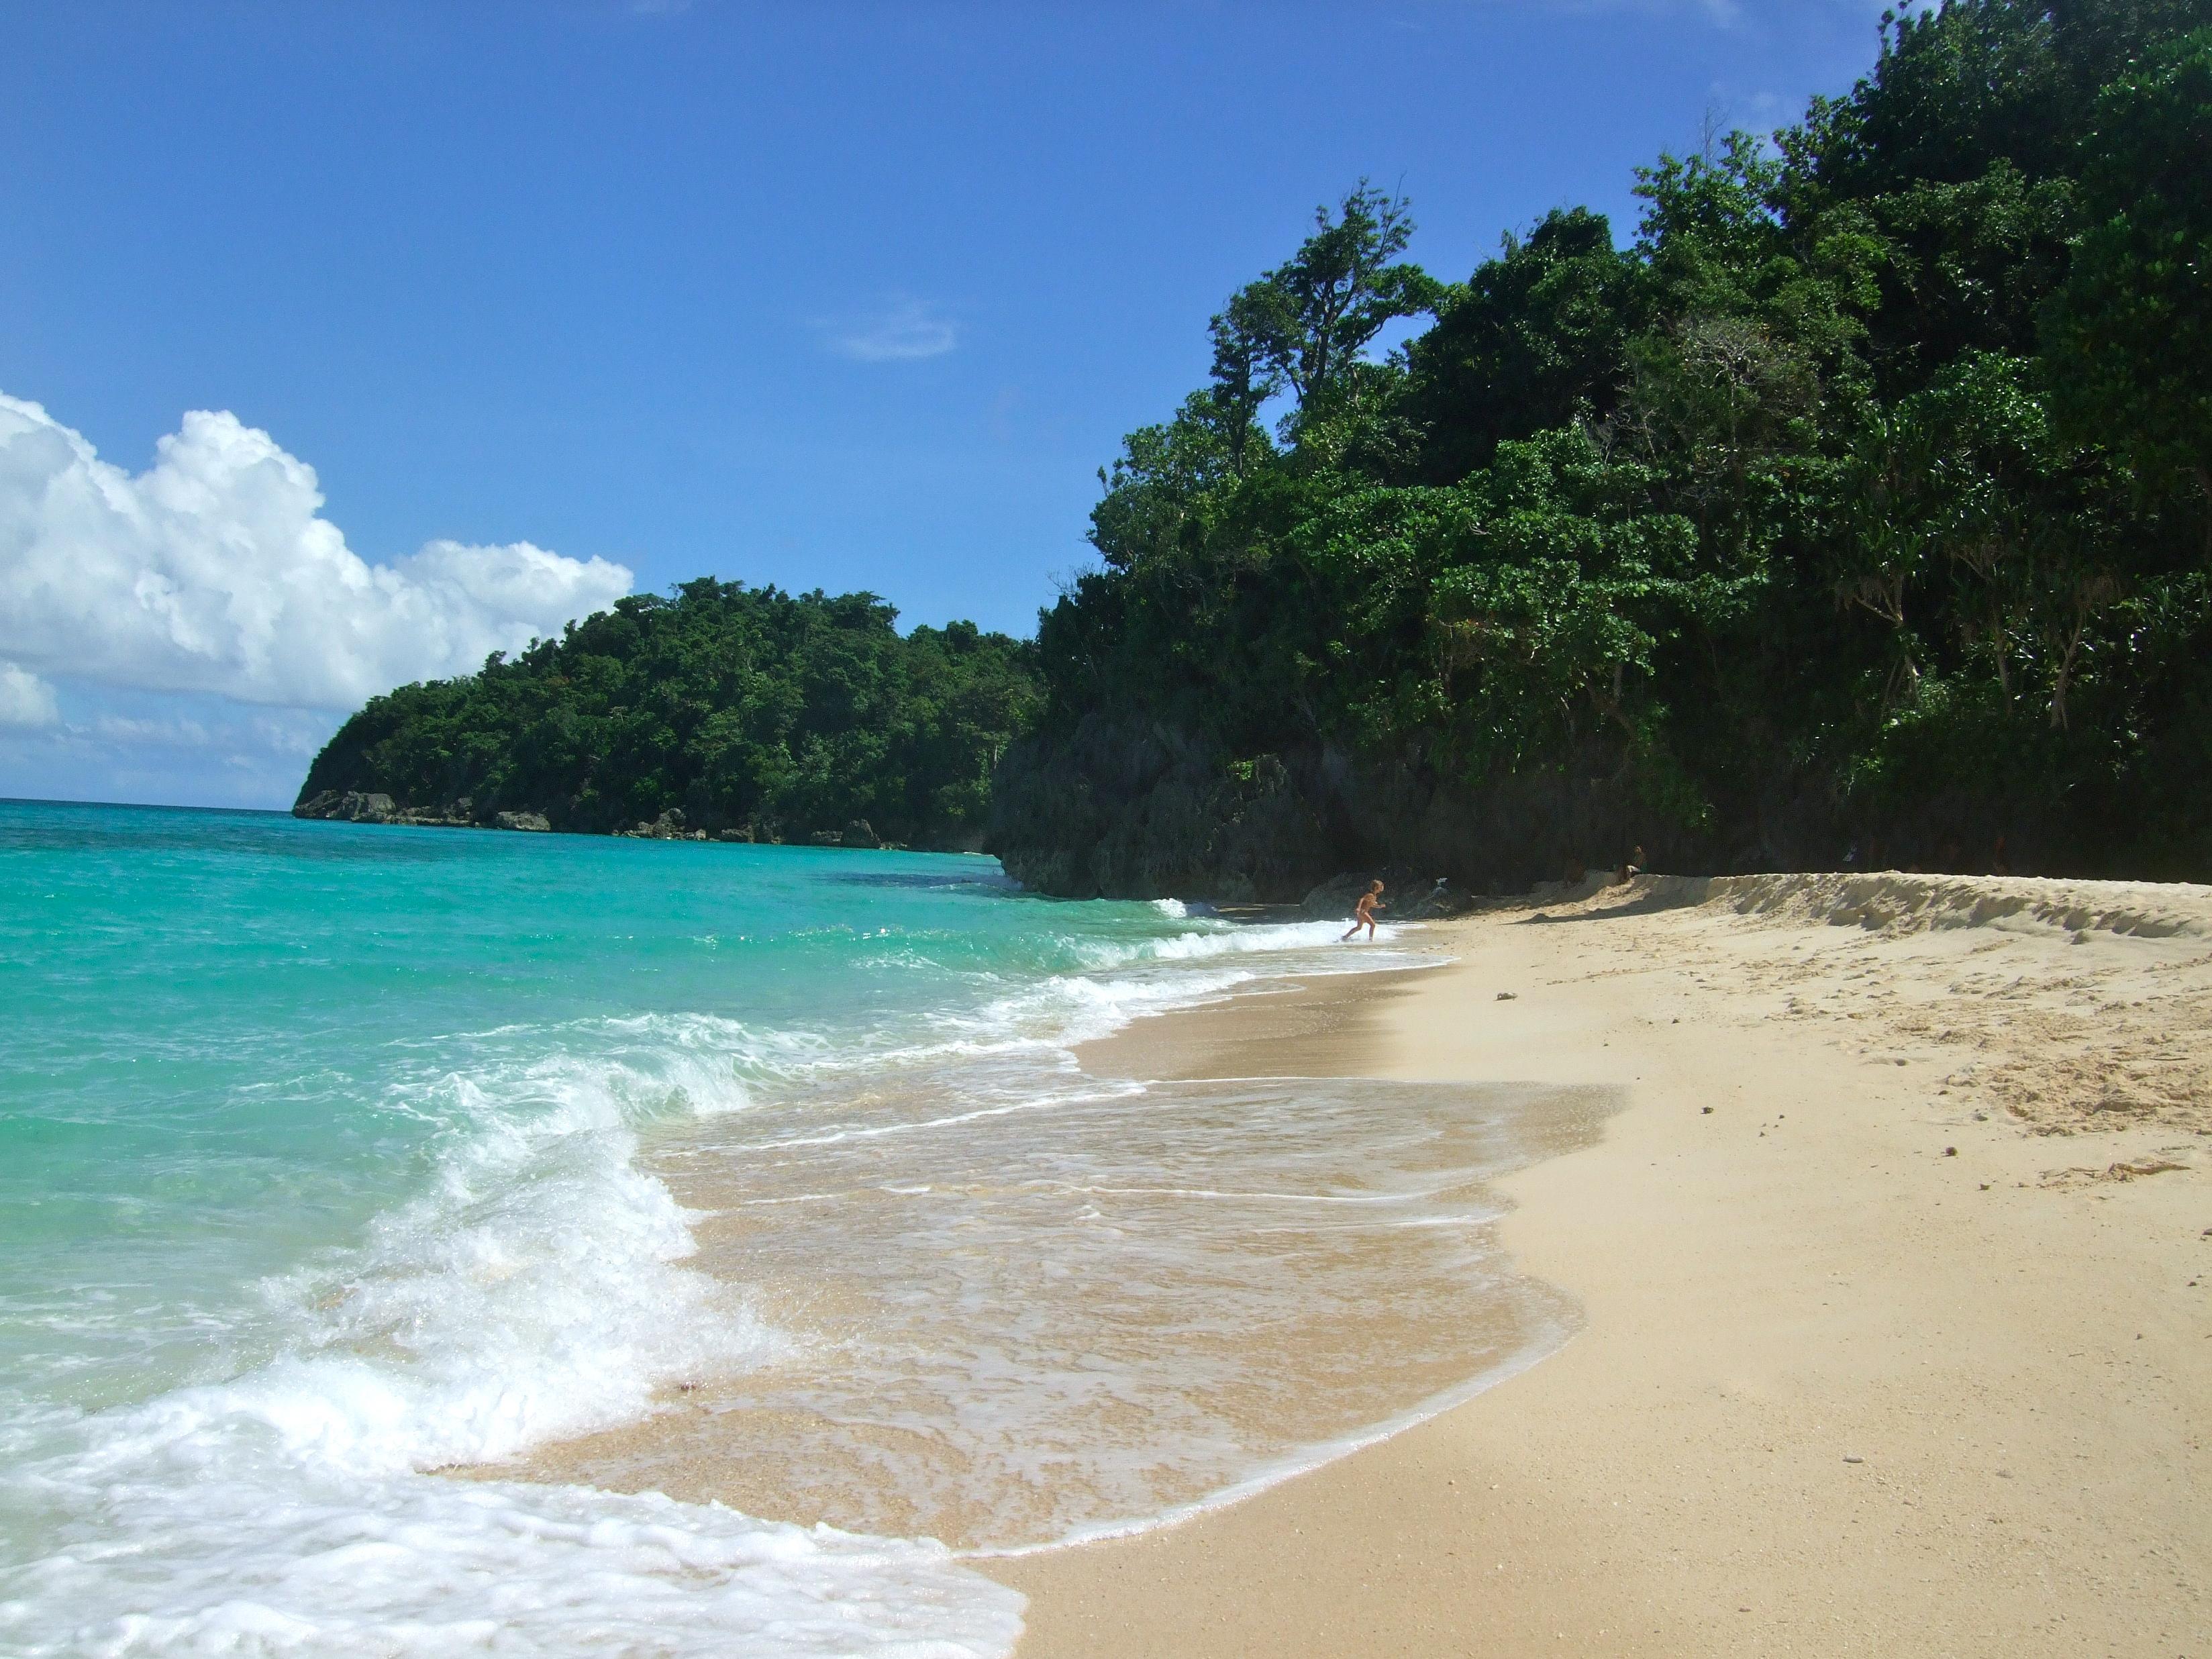 Traumstrände ohne Ende (Boracay)